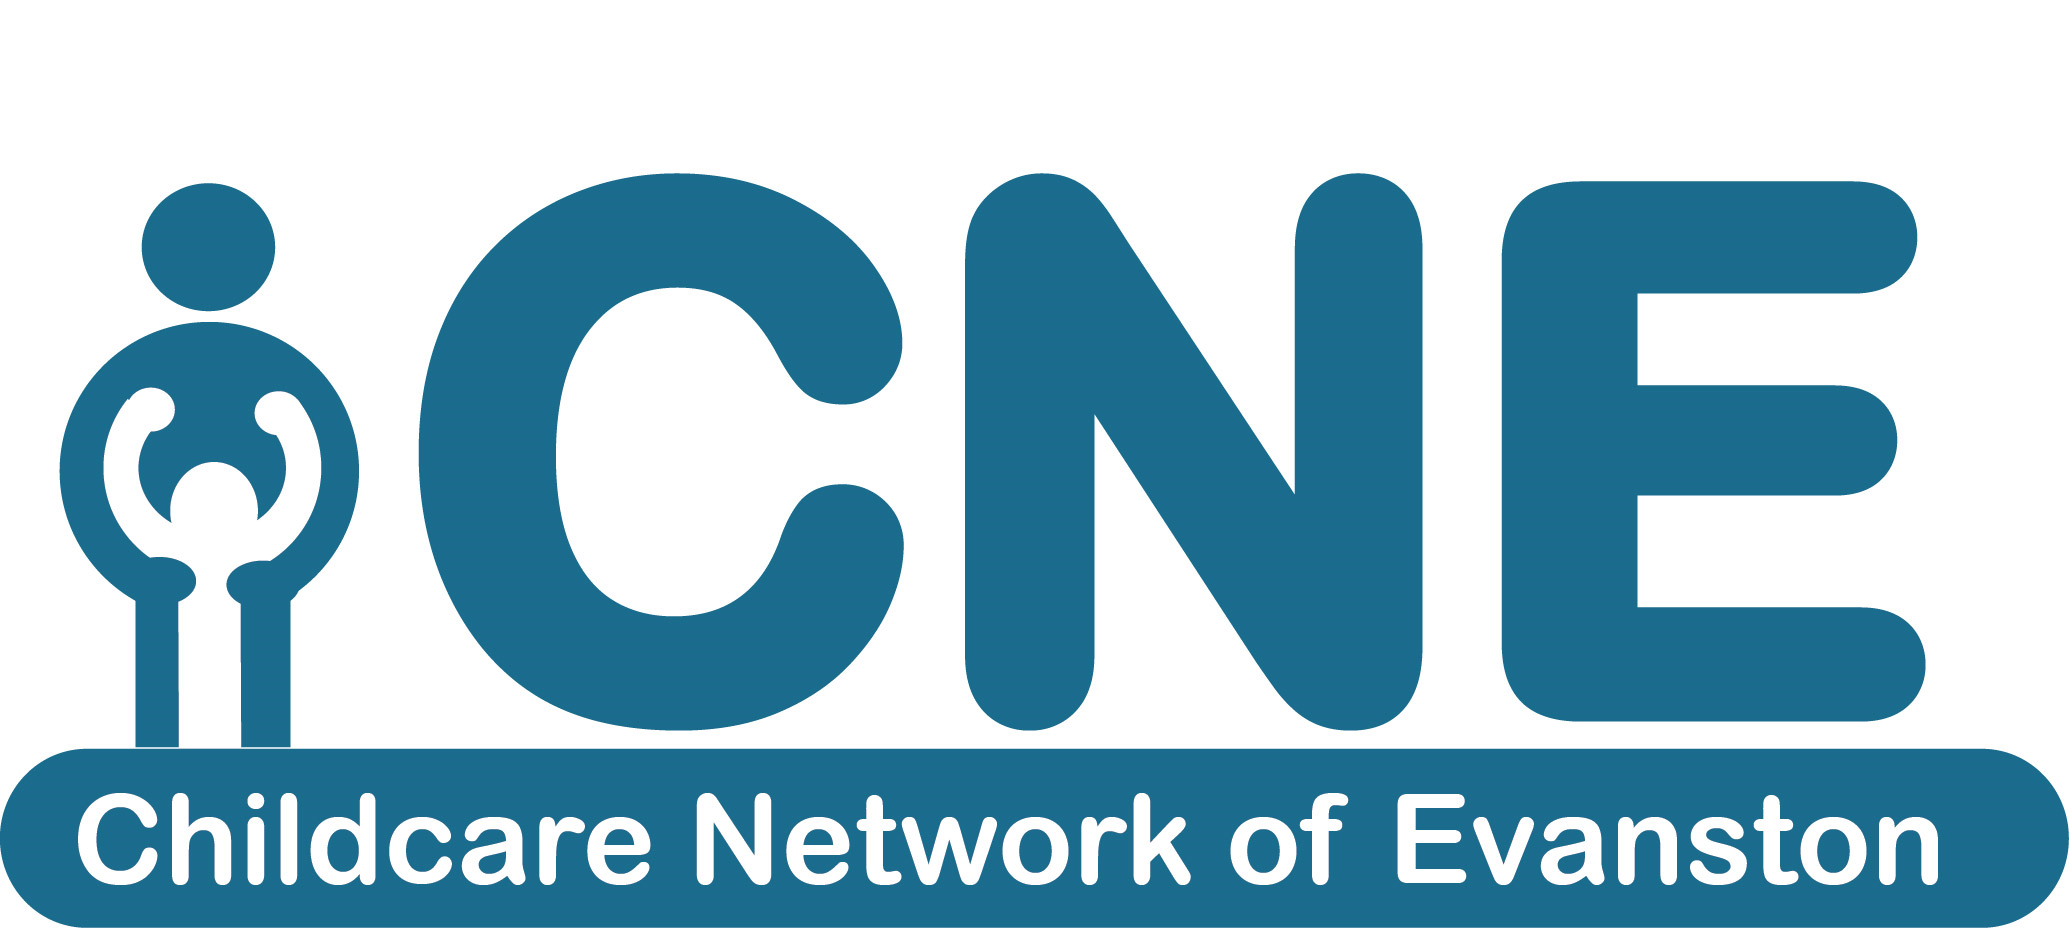 Childcare Network Of Evanston's Logo